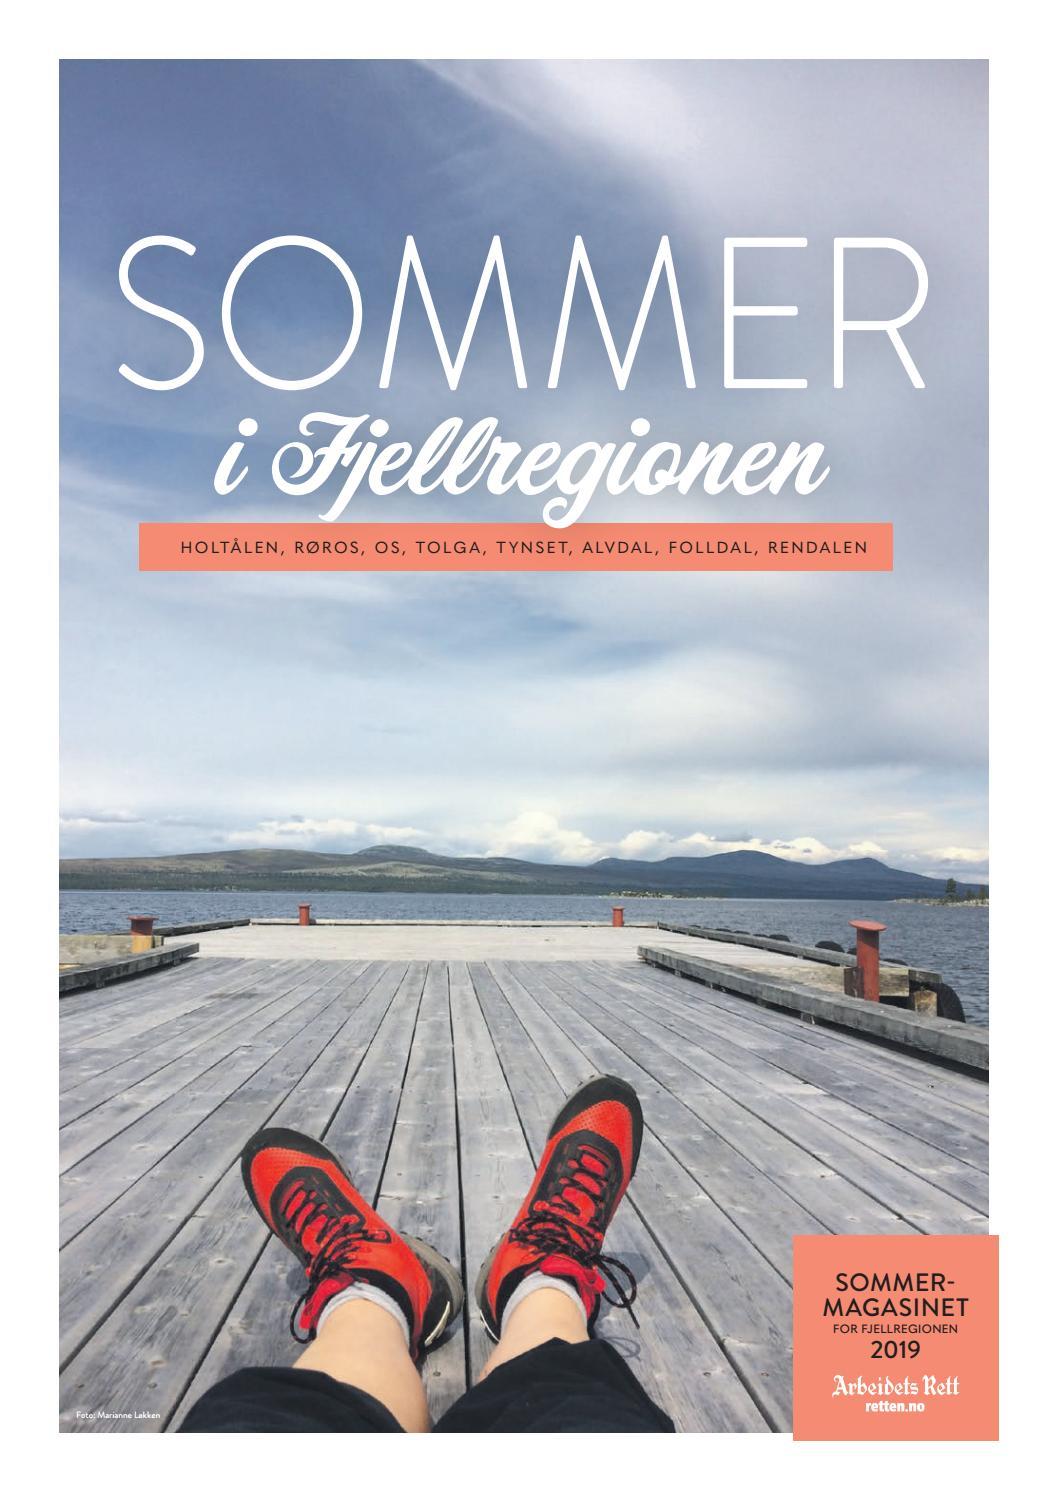 6c0f4f6ed Sommer i Fjellregionen by Amedia Annonseproduksjon AS - issuu